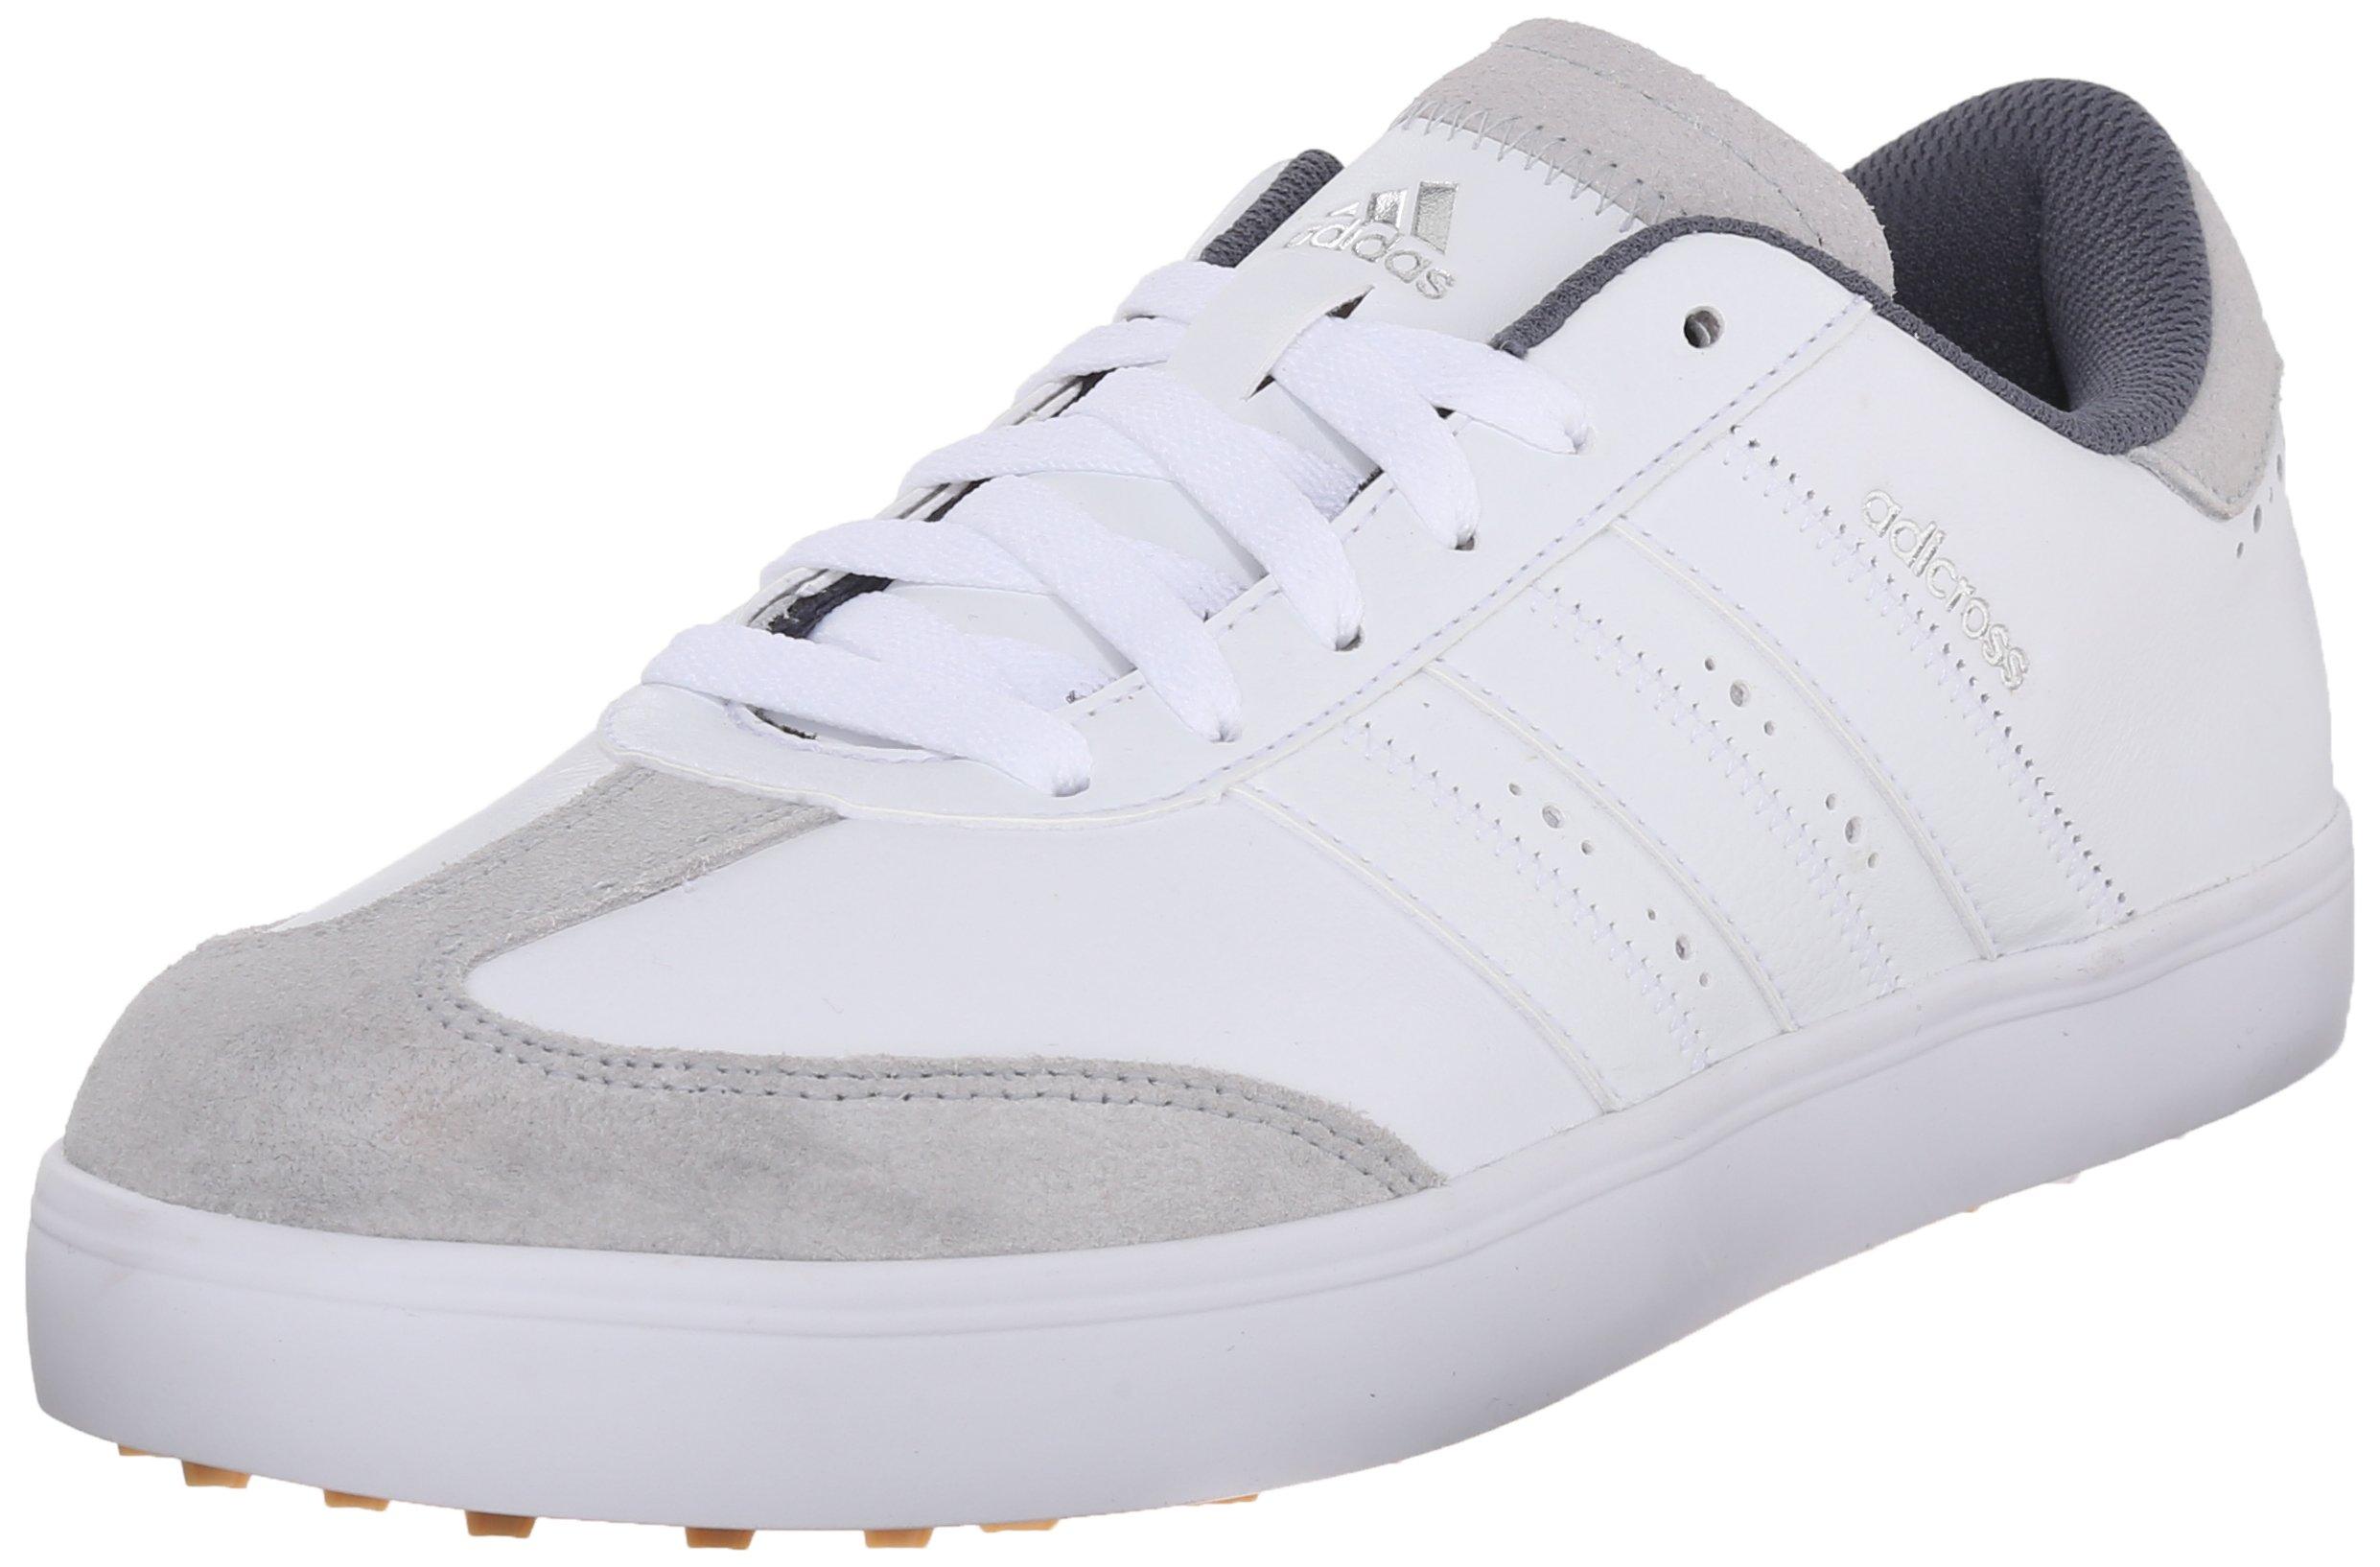 2dfdad4c8393 Galleon - Adidas Men s Adicross V WD Golf Spikeless